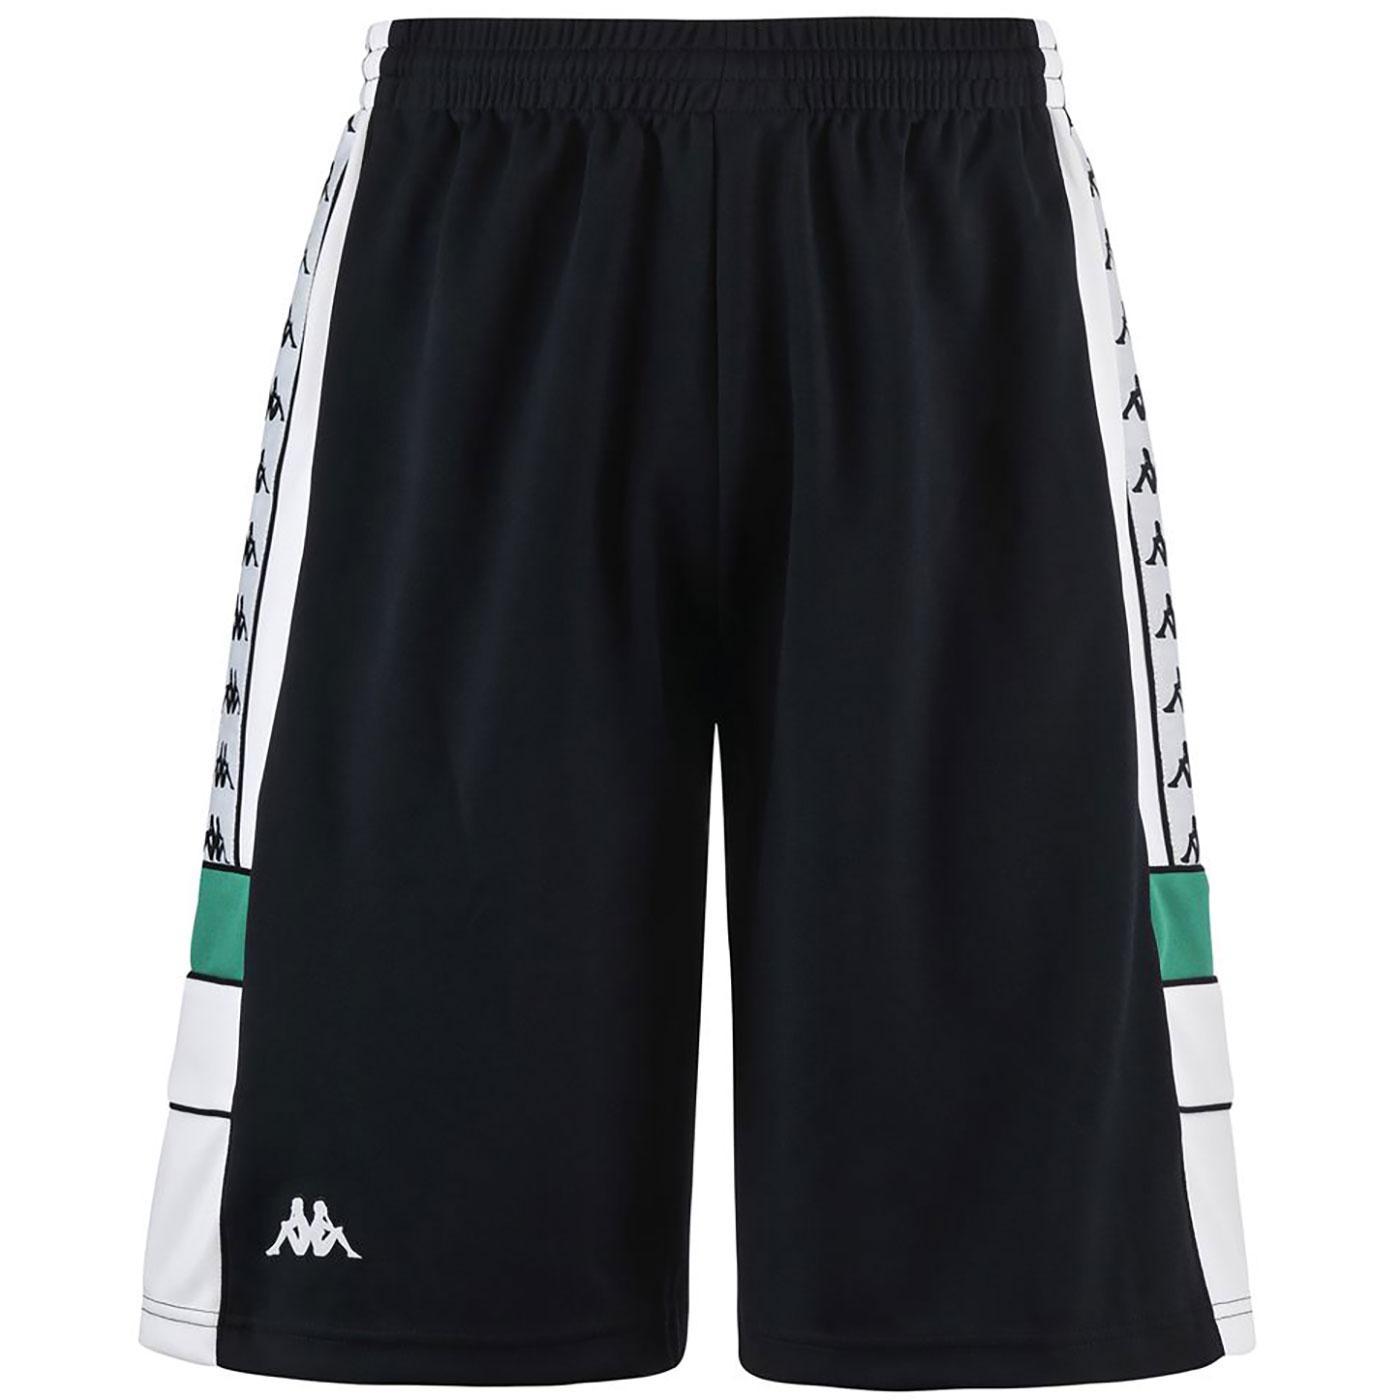 Arawa KAPPA 222 Banda Retro Colour Block Shorts